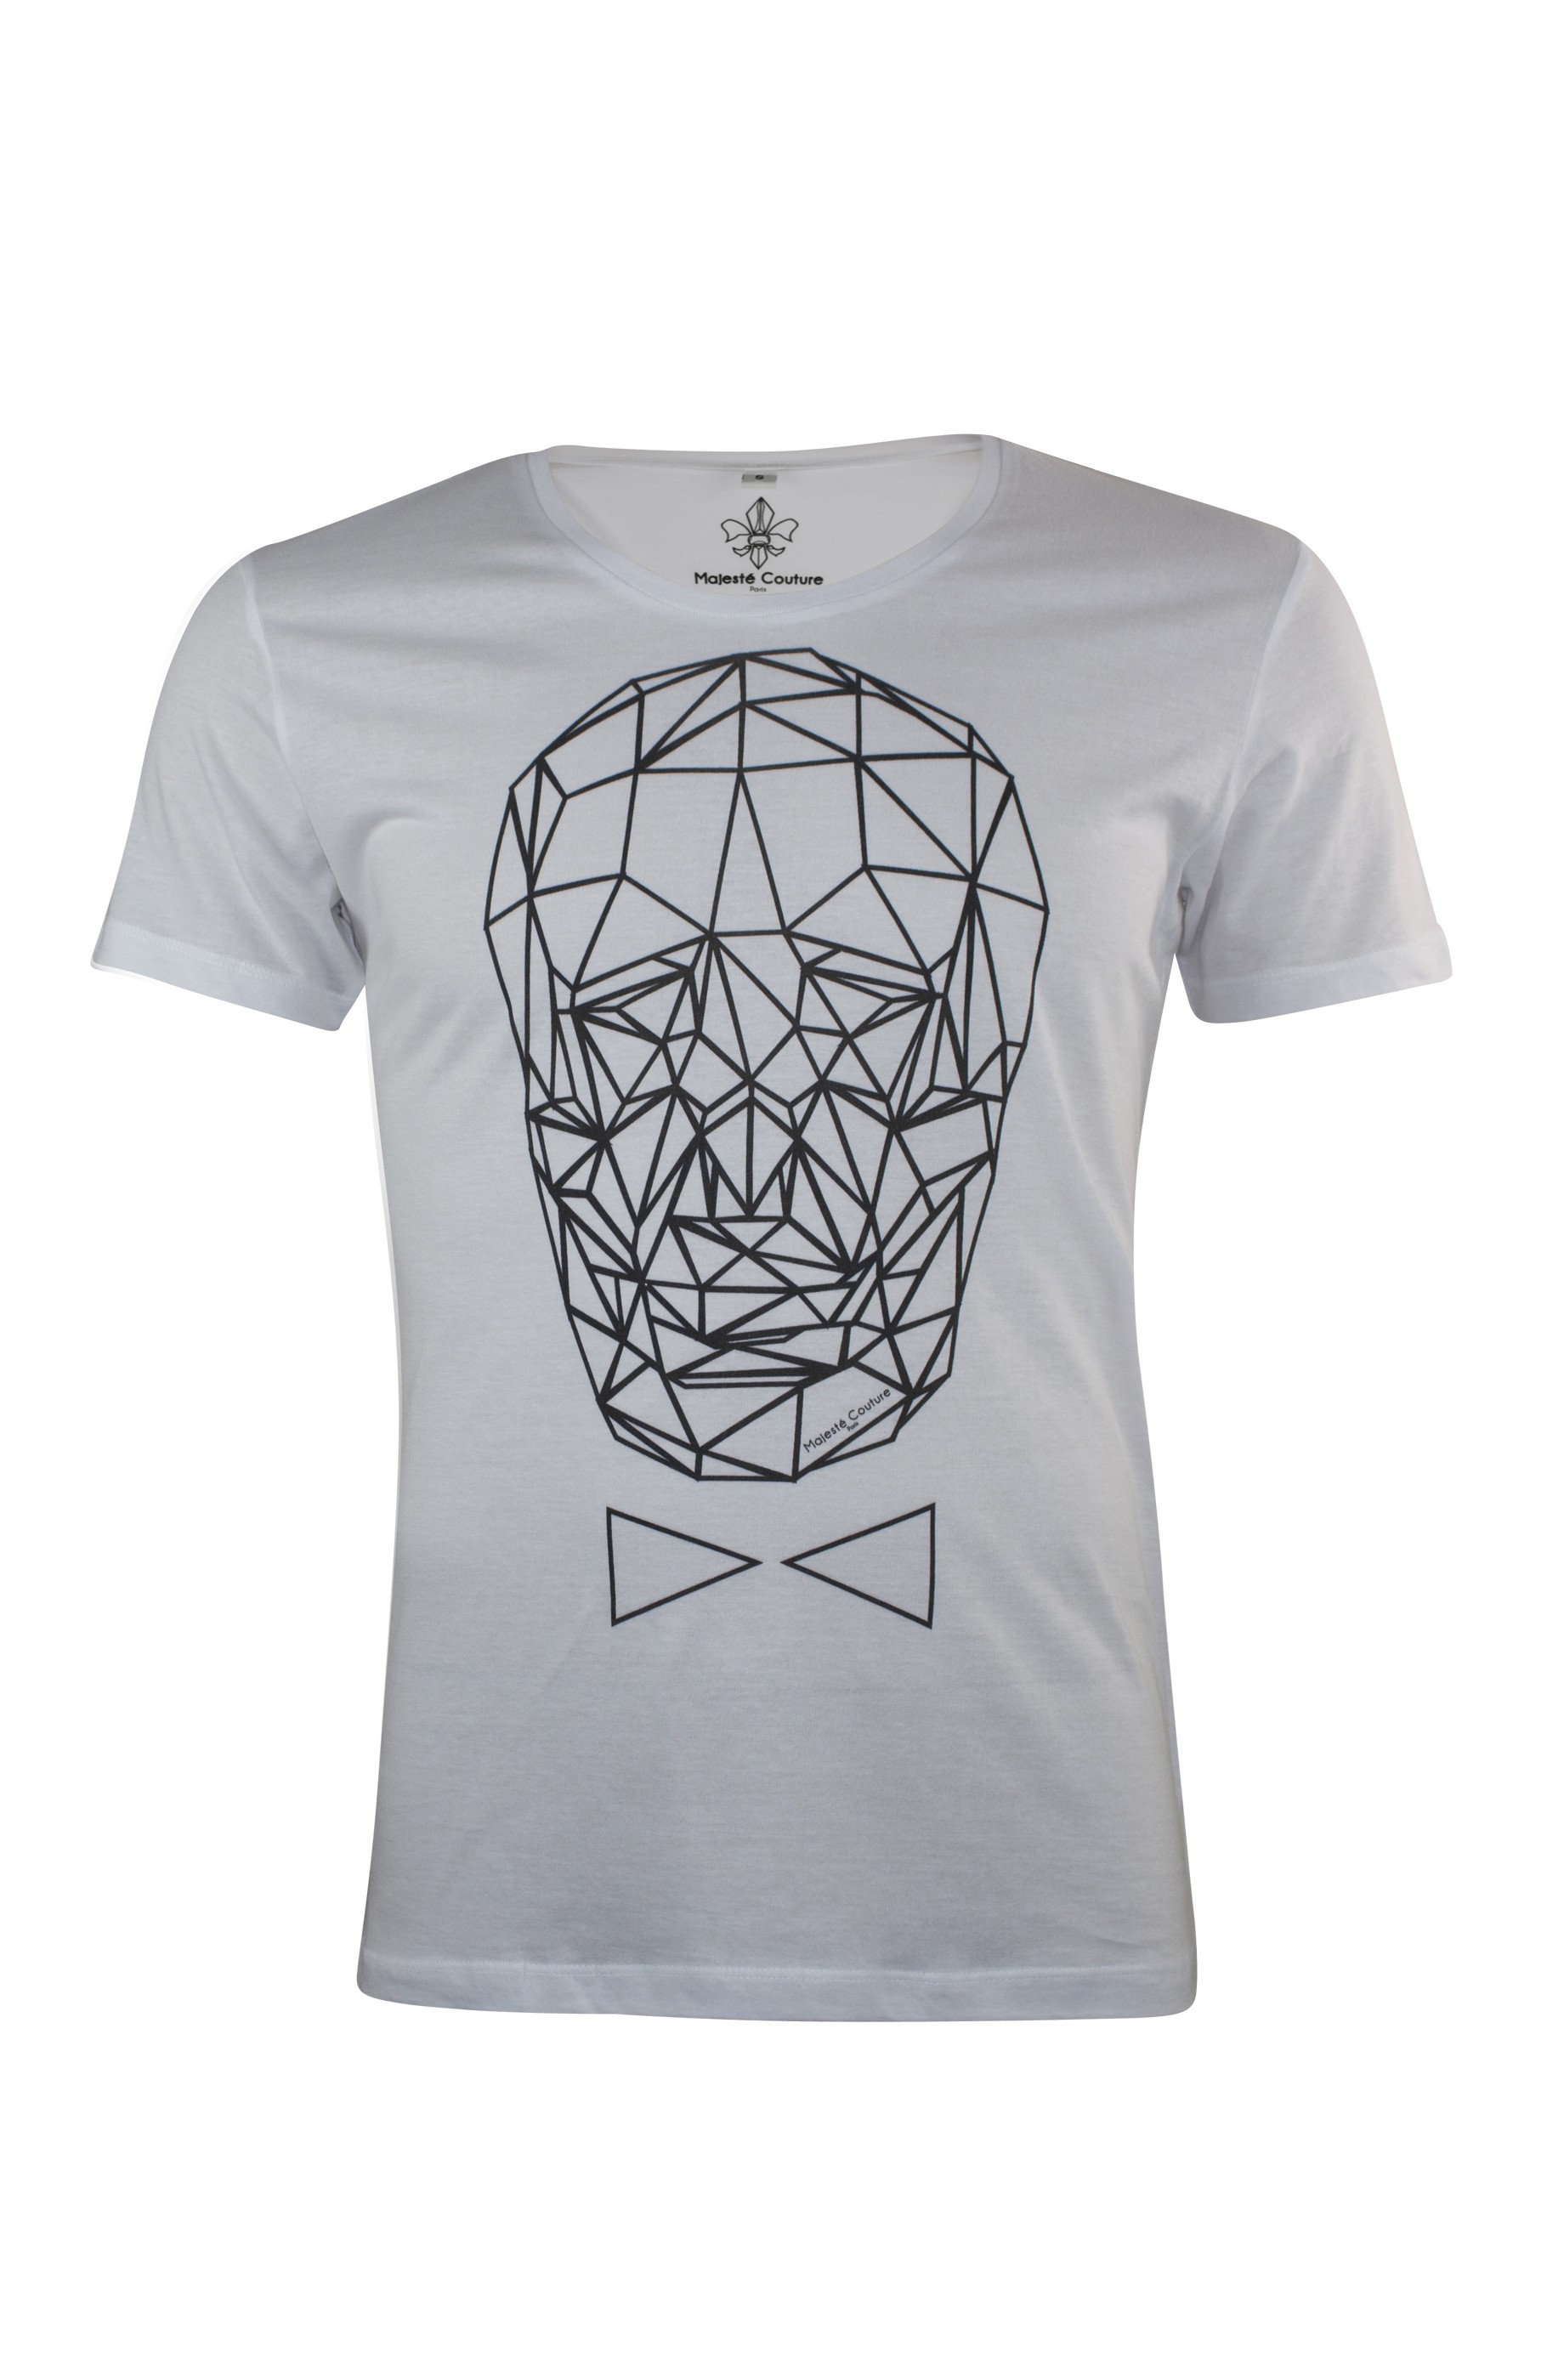 Majesté Couture Paris: WHITE GRAPHIC_TDM T-SHIRT   Clothing,Clothing > T-Shirts -  Hiphunters Shop